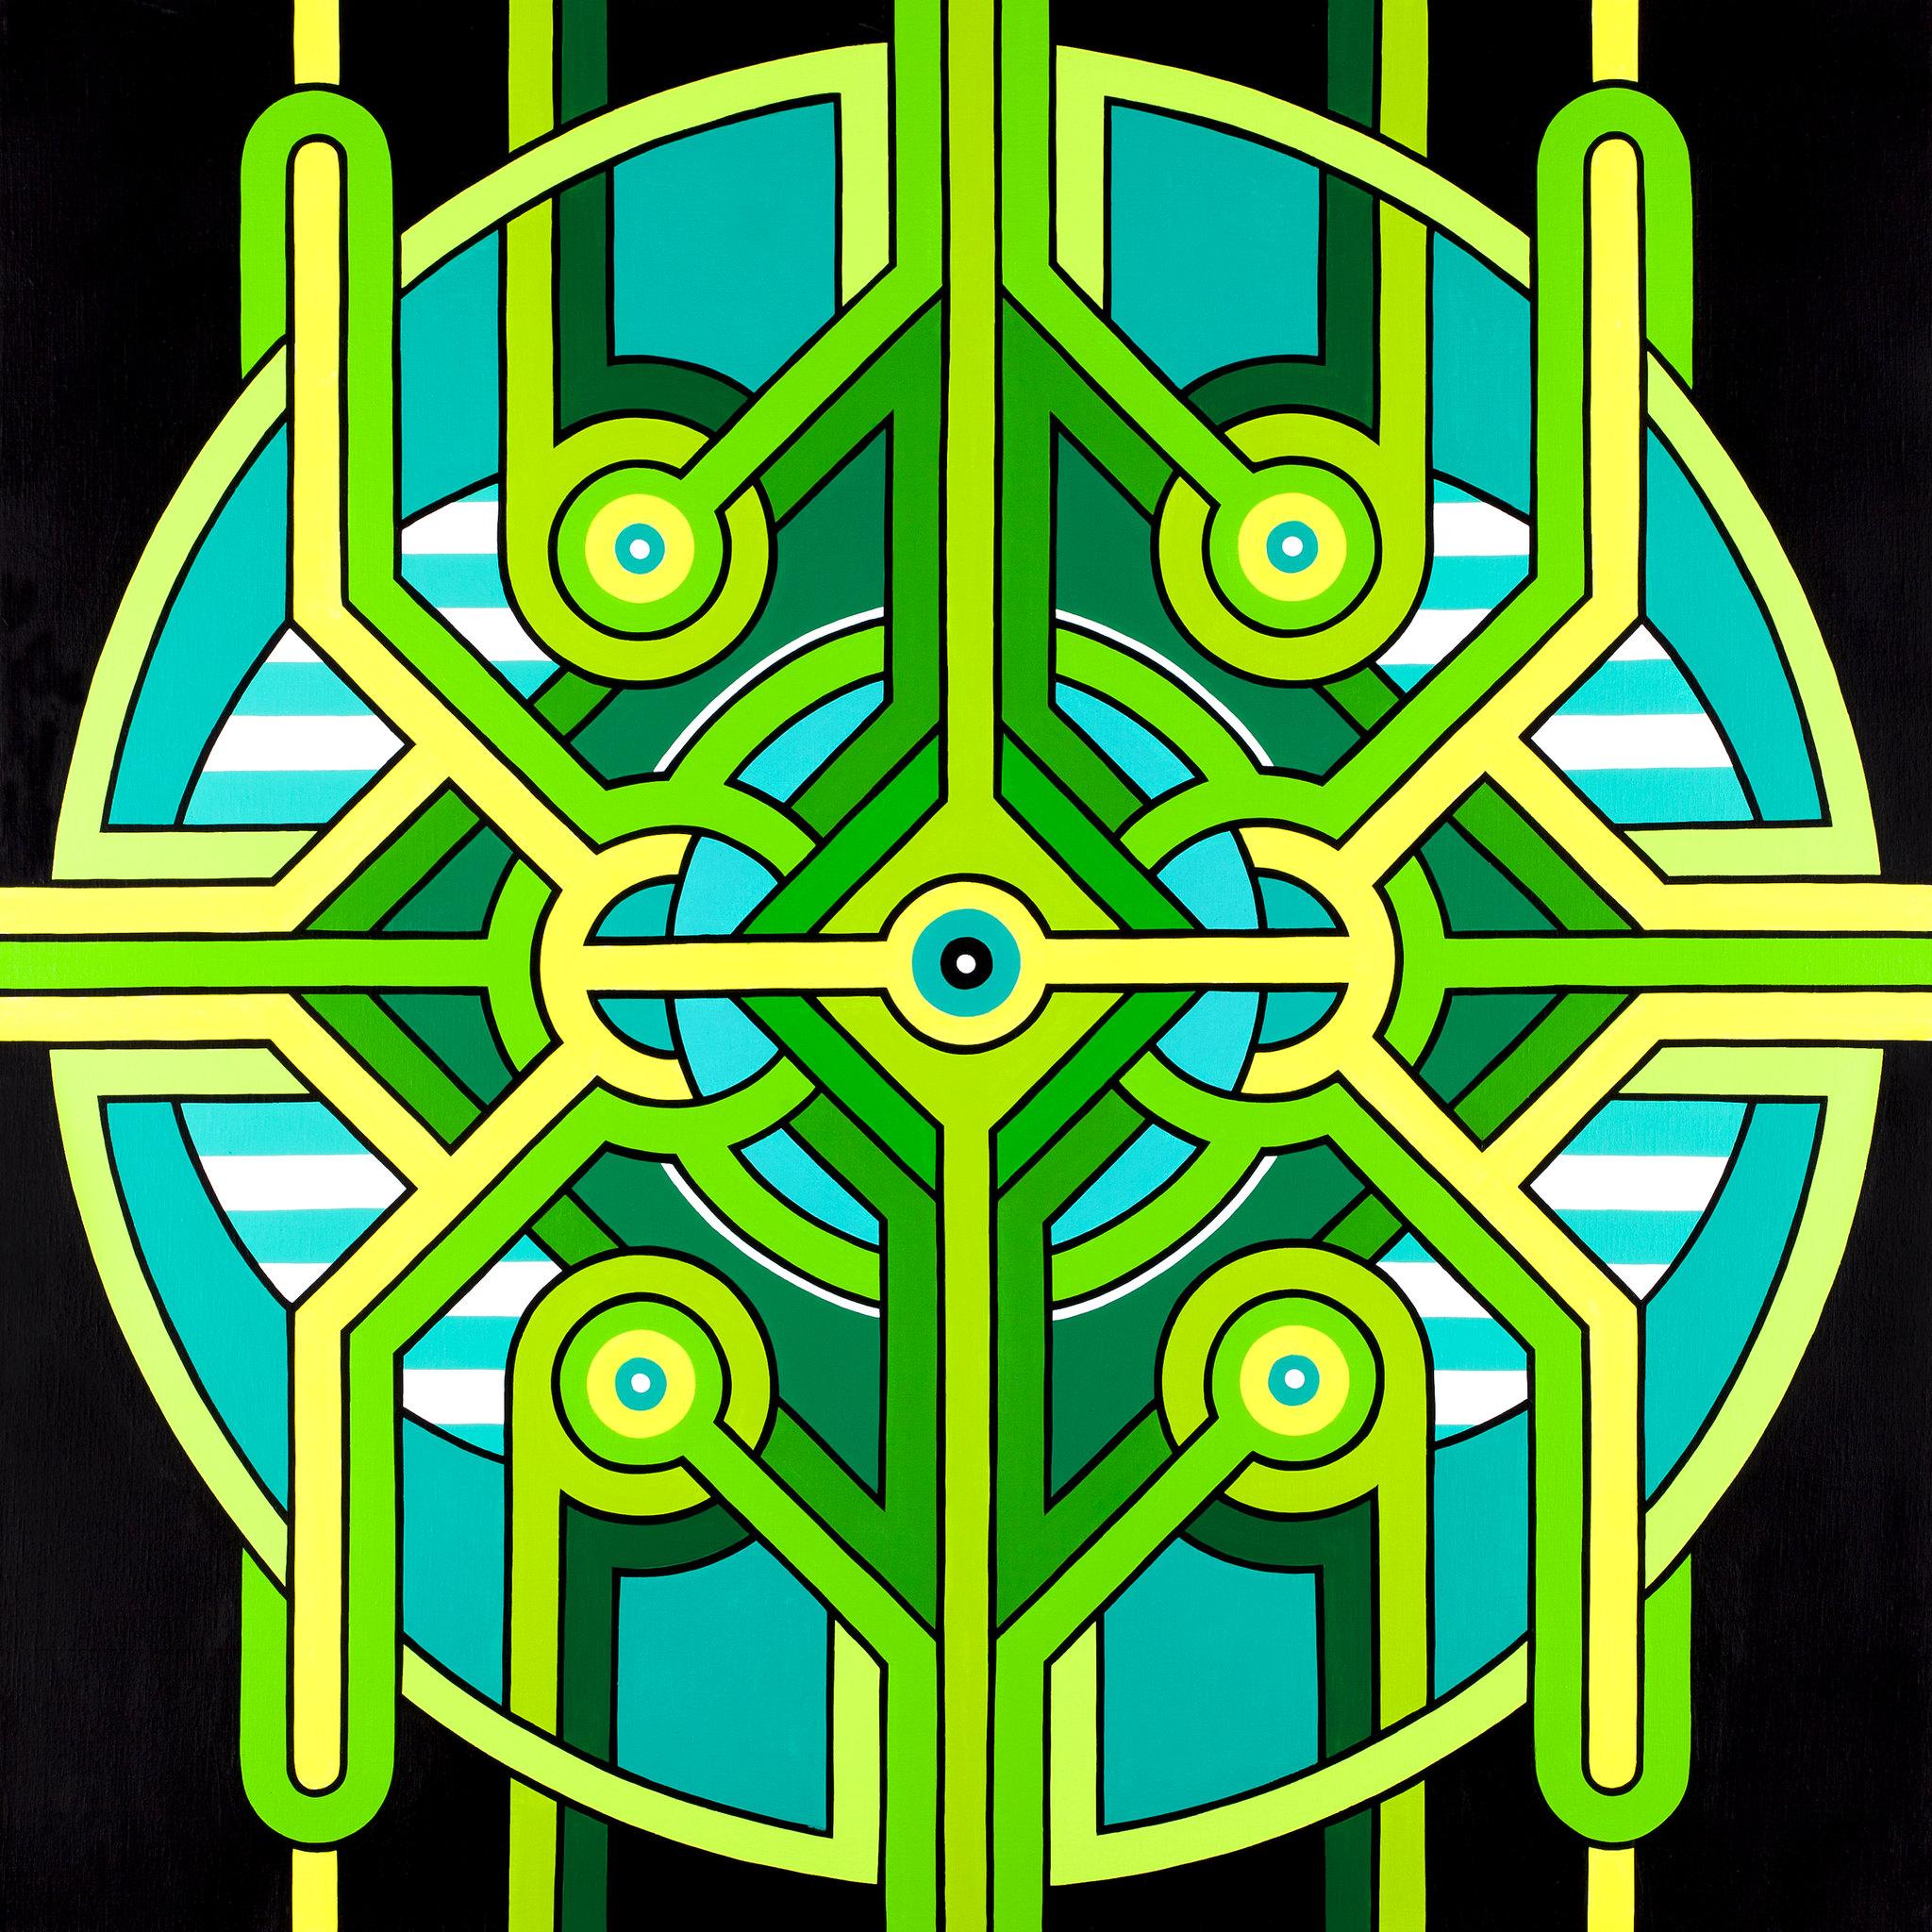 magnetikoglyphe